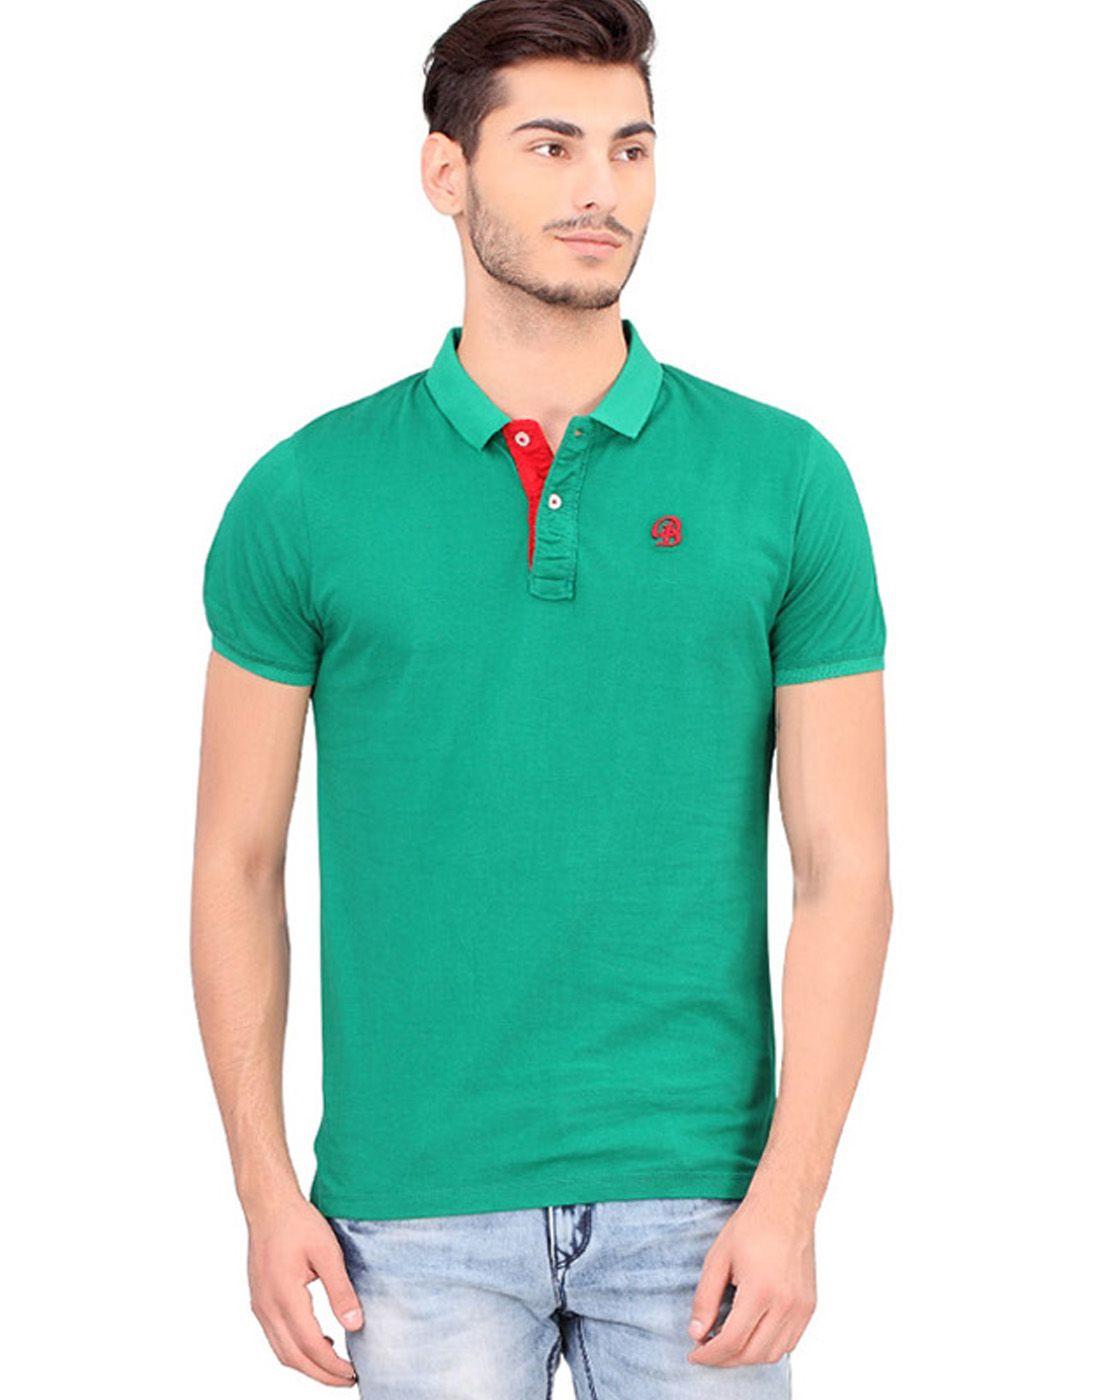 BONATY Green 100% Cotton Peach Finish Polo Neck Solid T-Shirt For Men